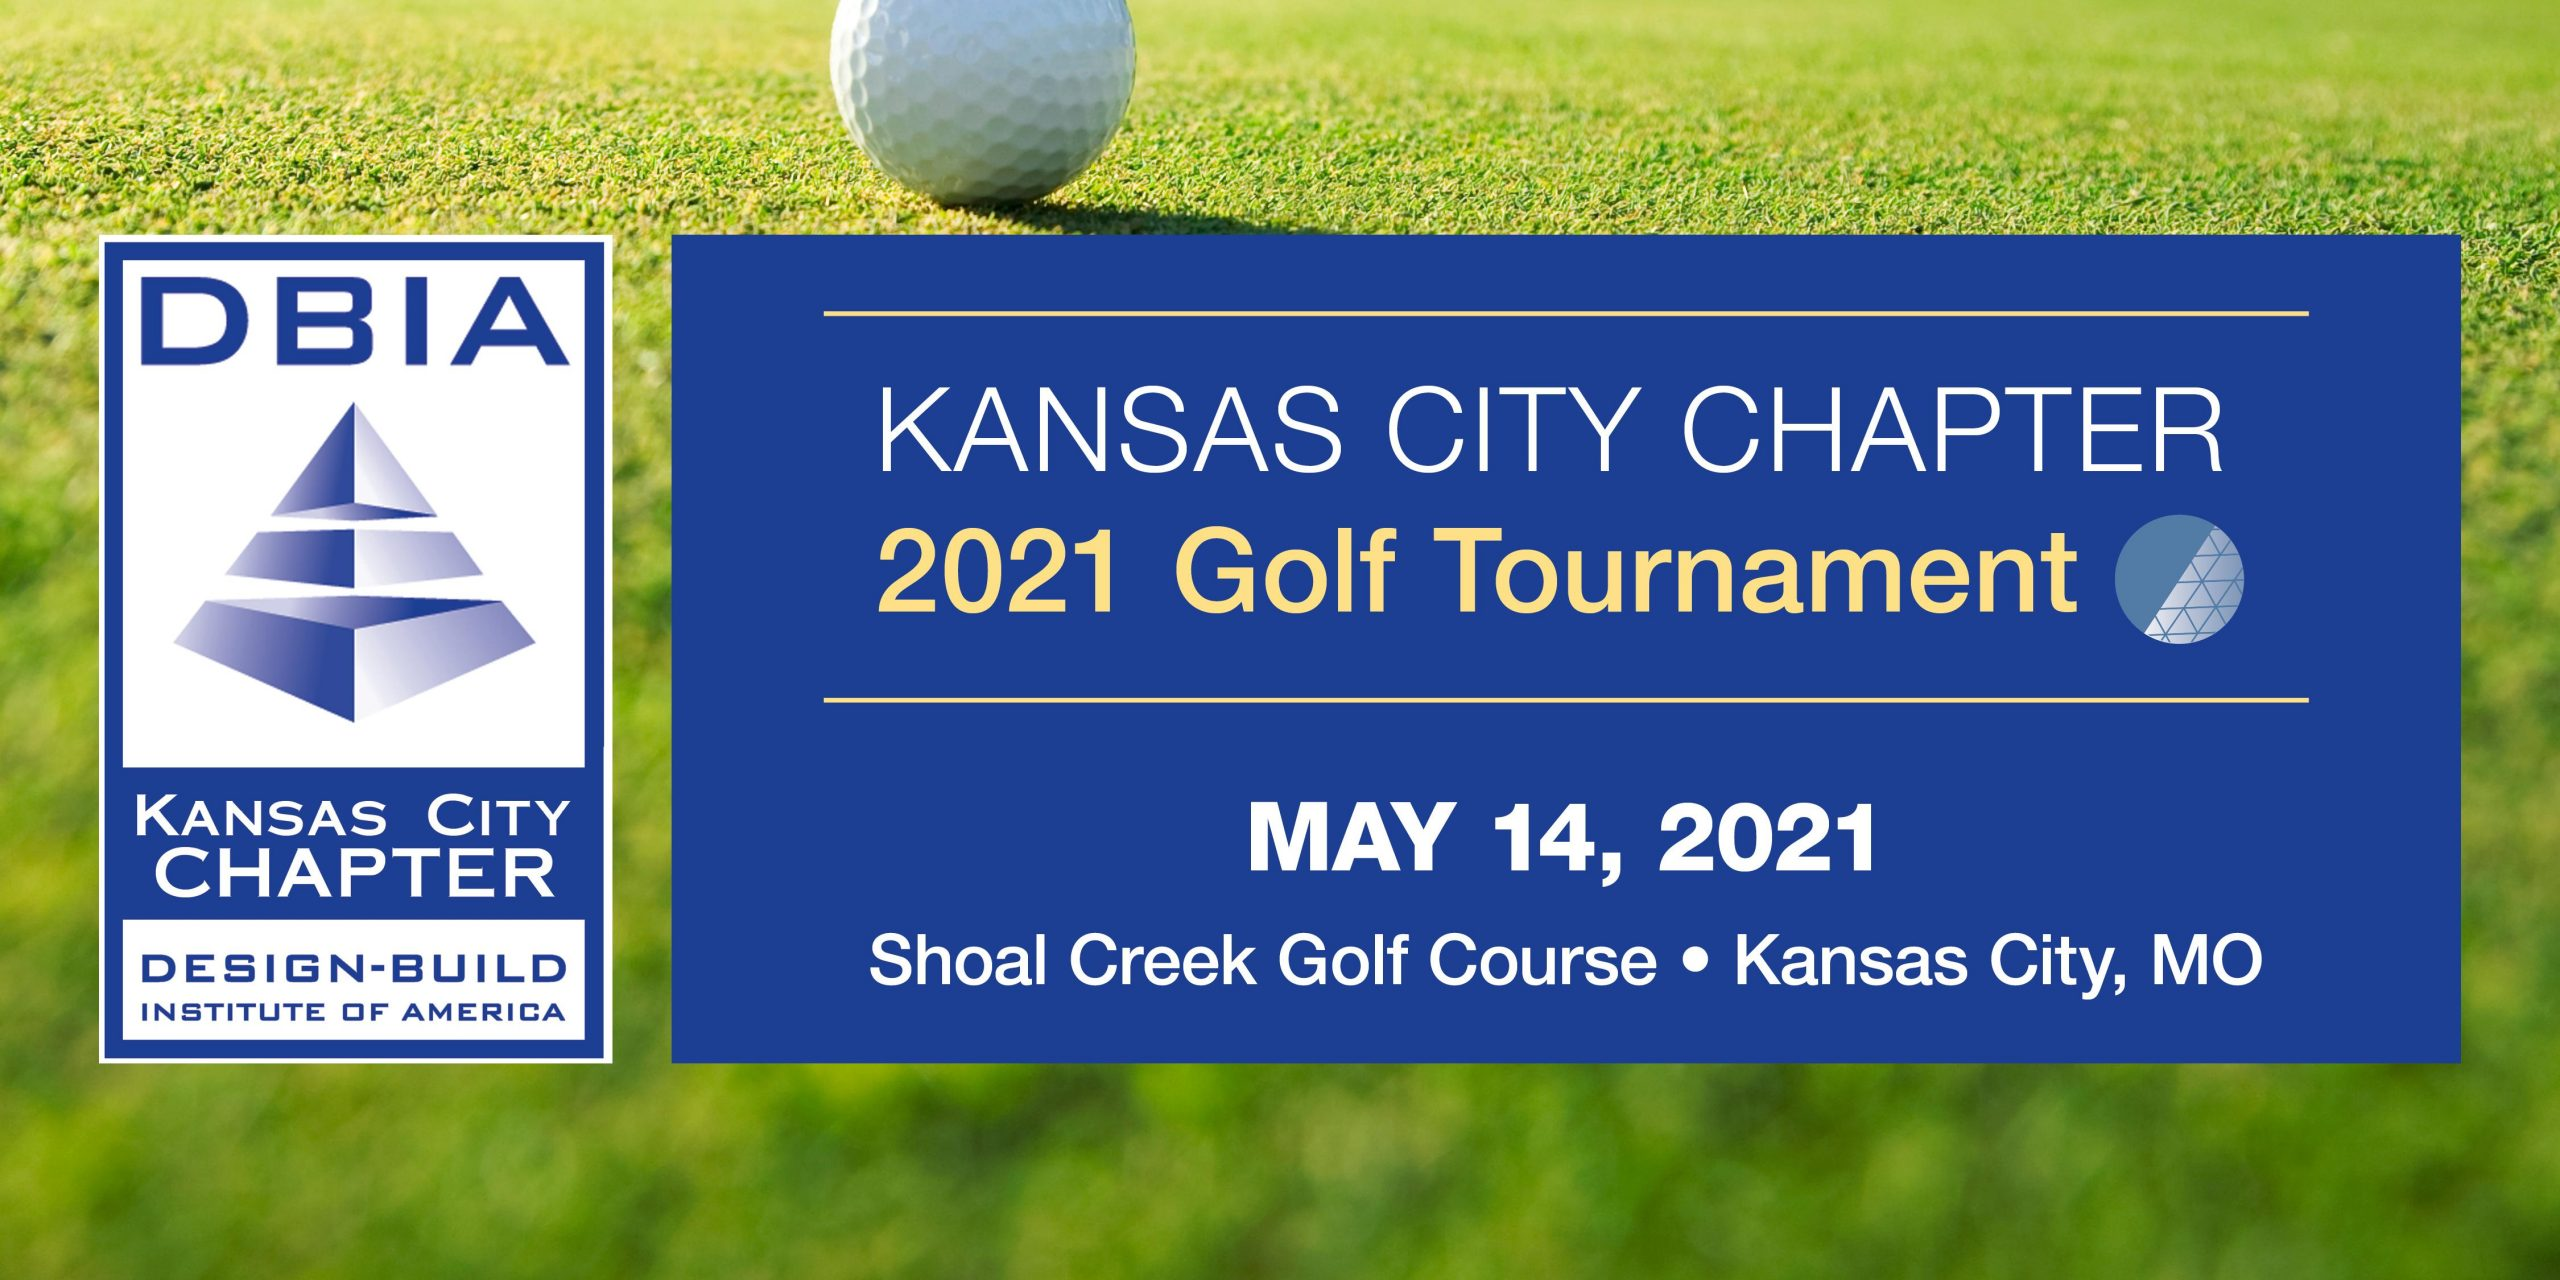 DBIA-MAR 2021 Golf Tournament